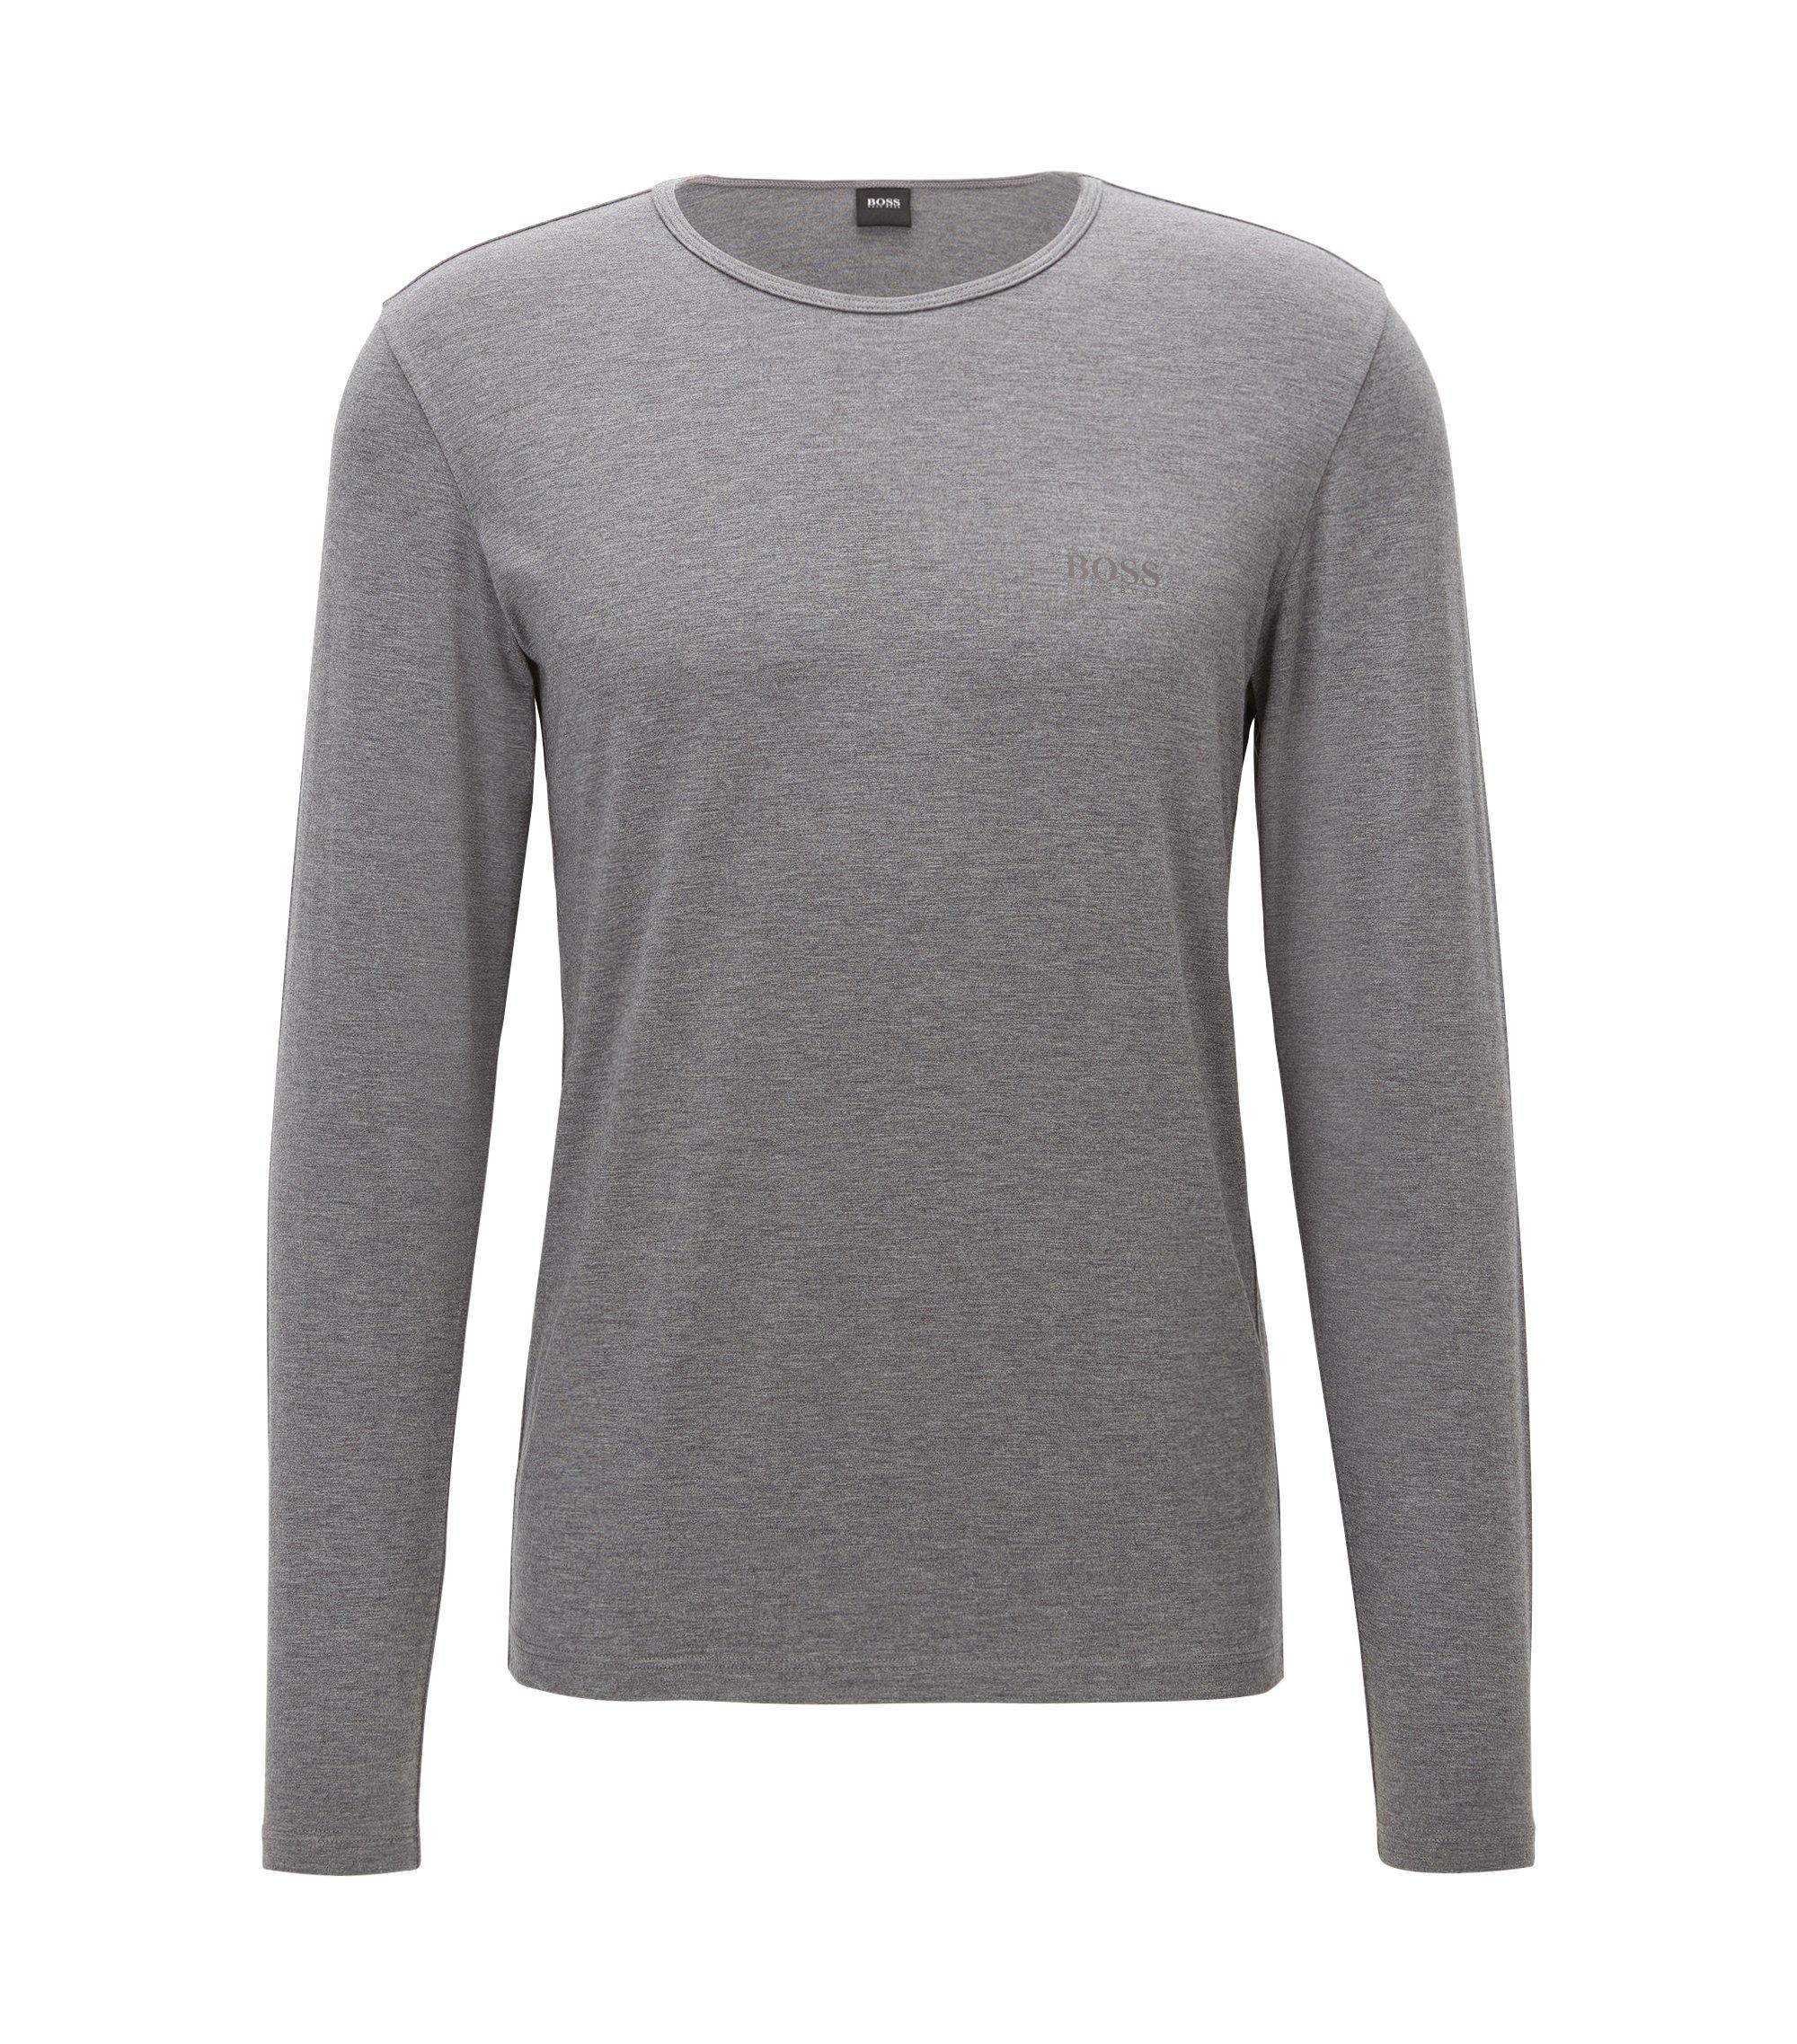 Stretch Thermal Long Sleeve T-Shirt | LS Shirt RN Thermal, Charcoal